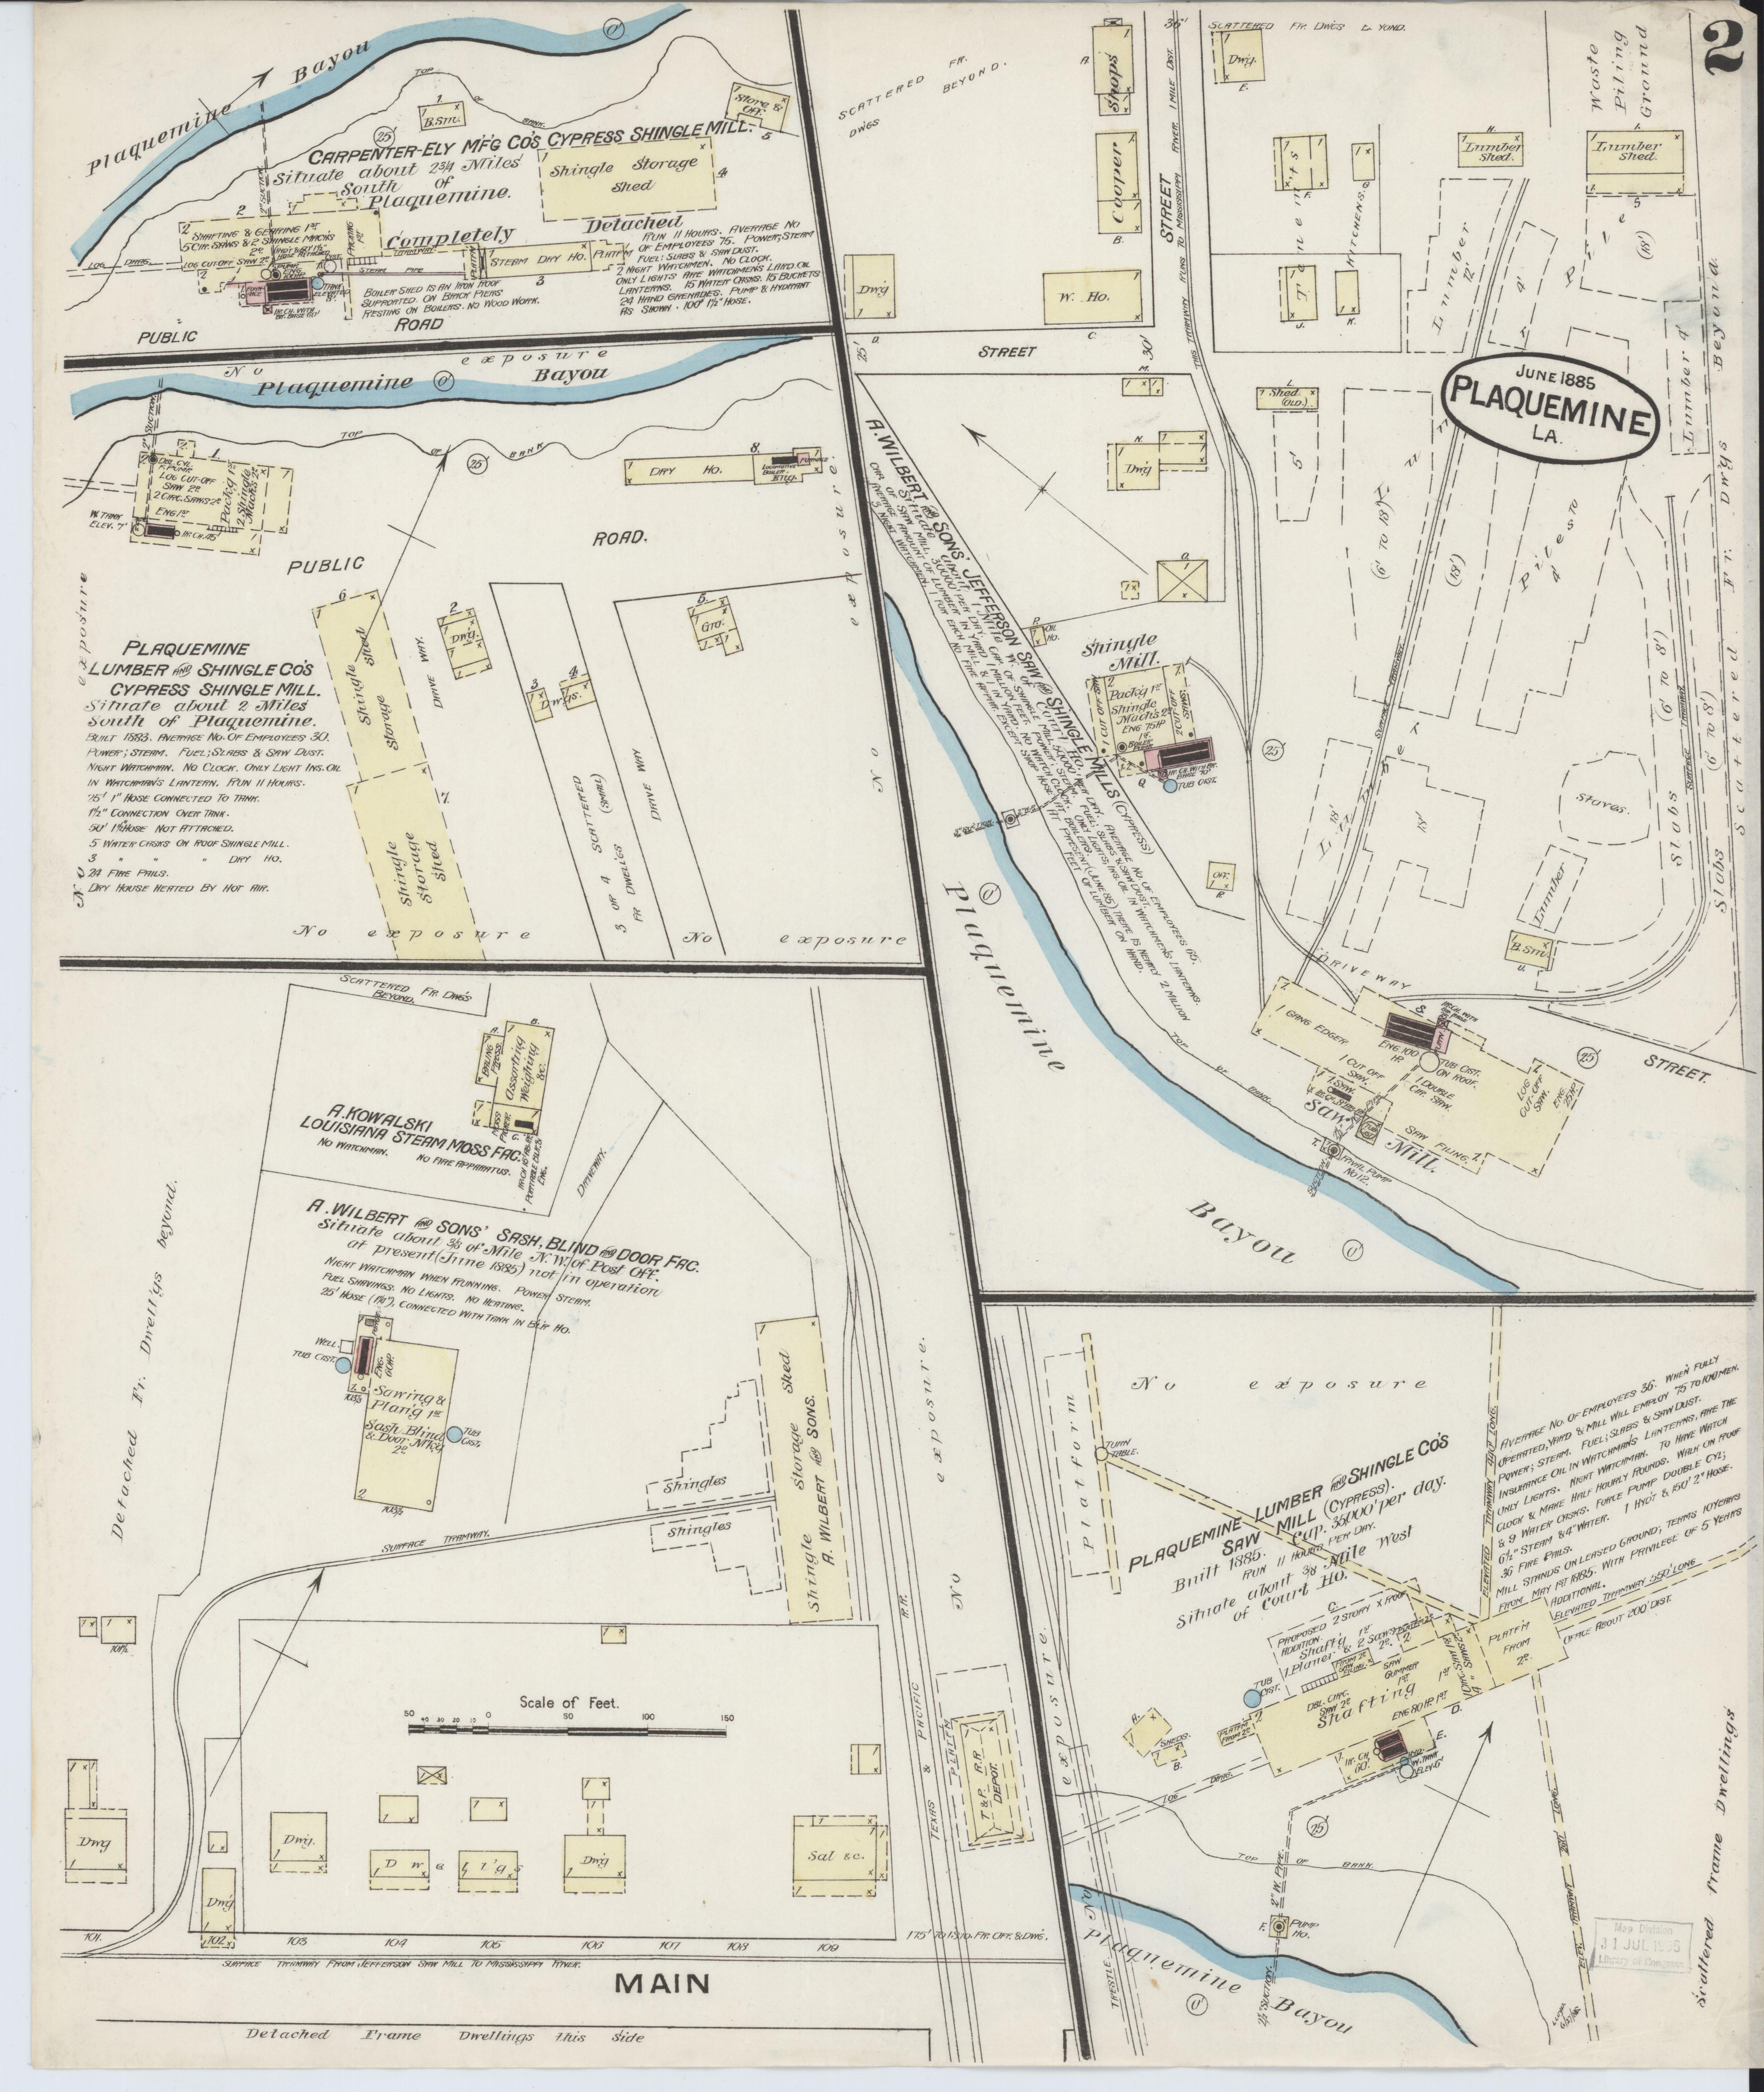 I 20 Louisiana Map.File Sanborn Fire Insurance Map From Plaquemine Iberville Parish